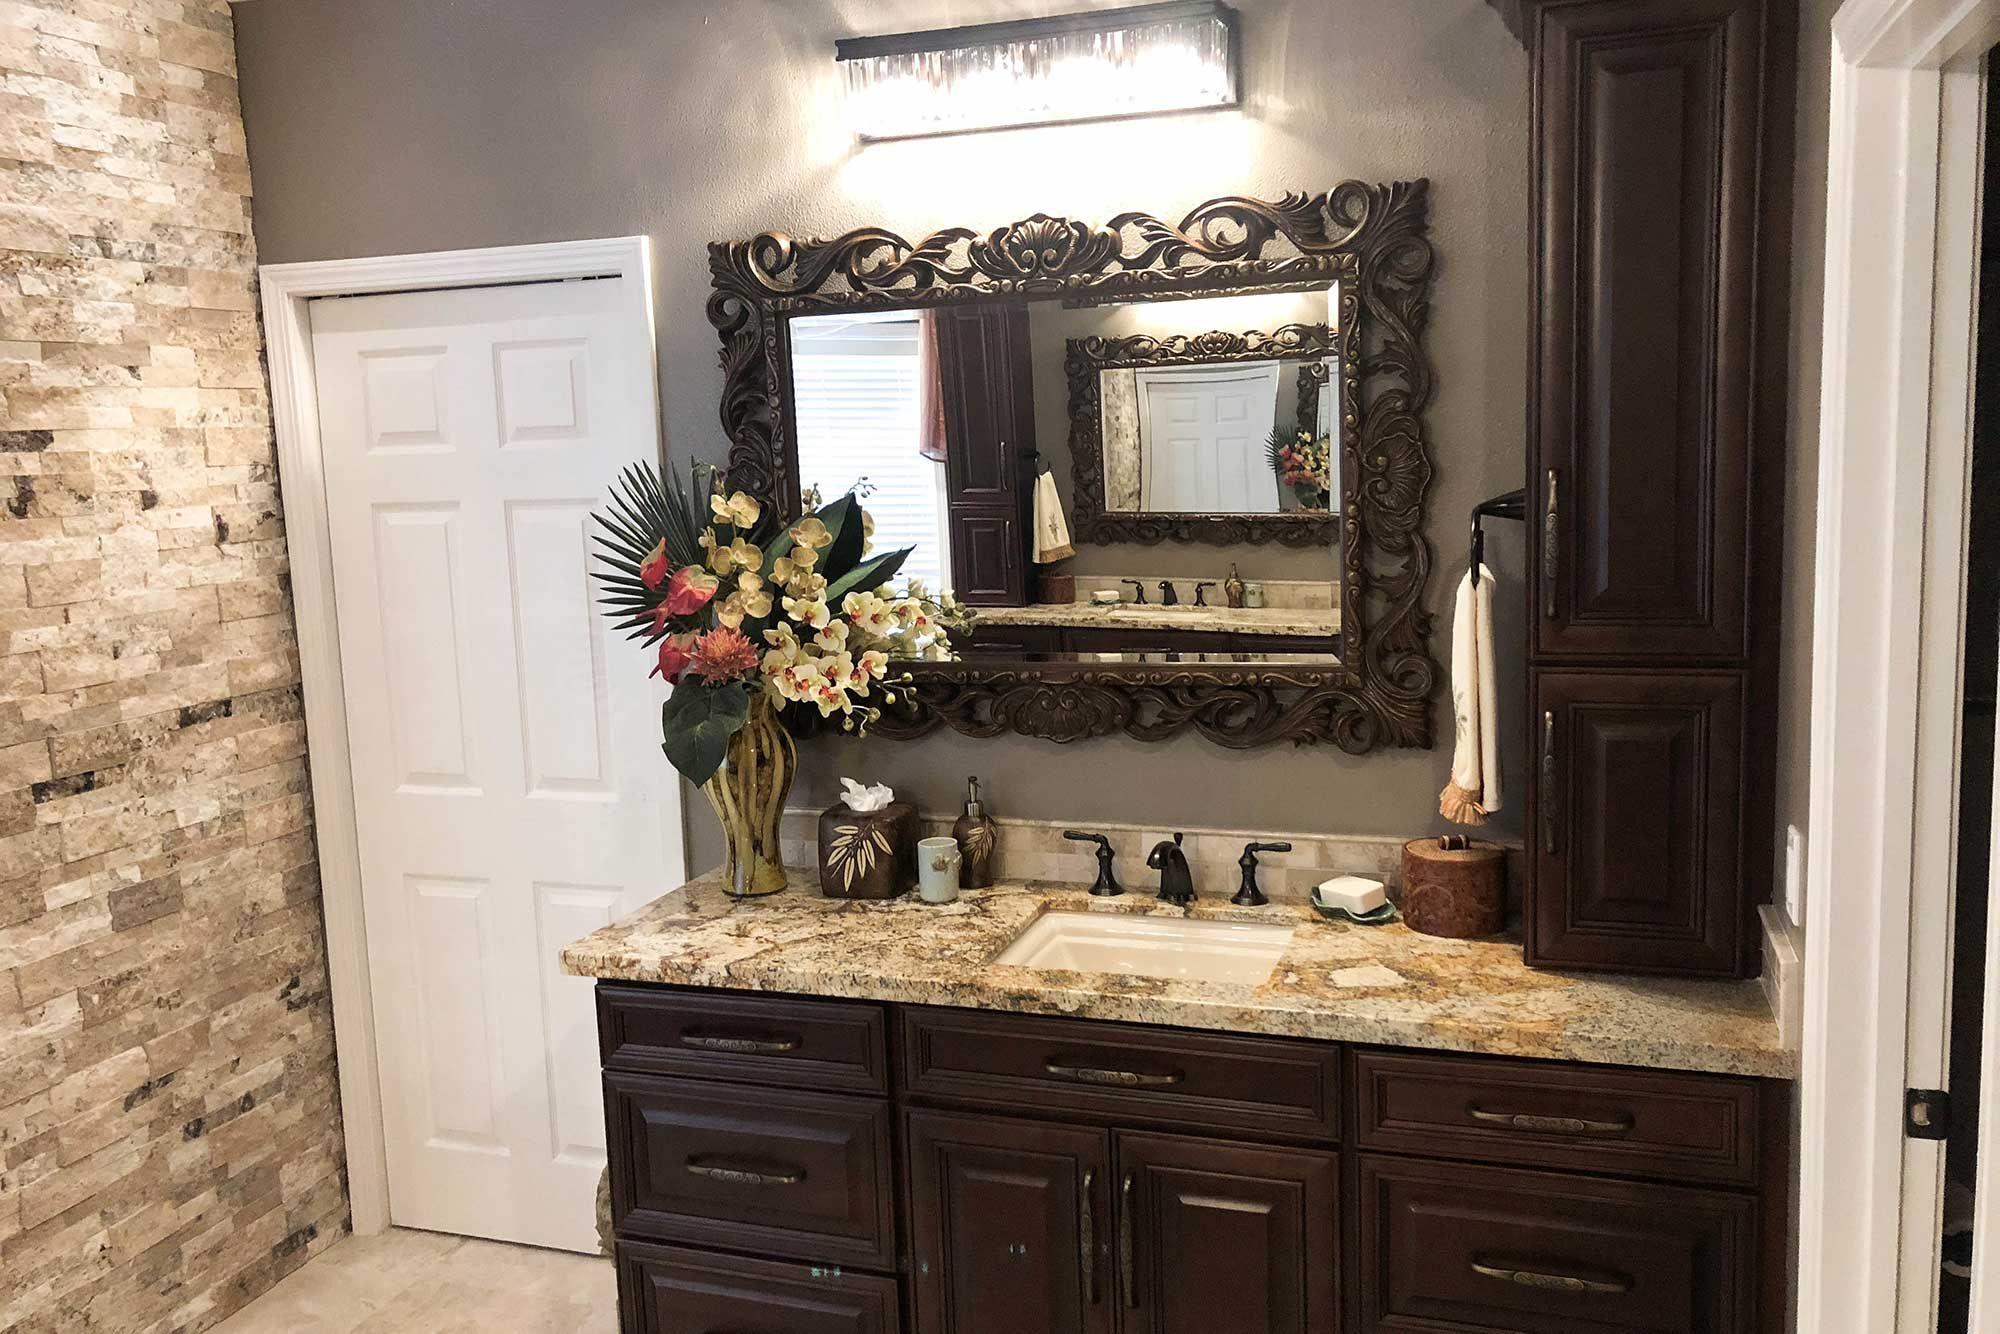 Bathroom cabinet   Tuscan inspired, Bathroom design, Cabinet